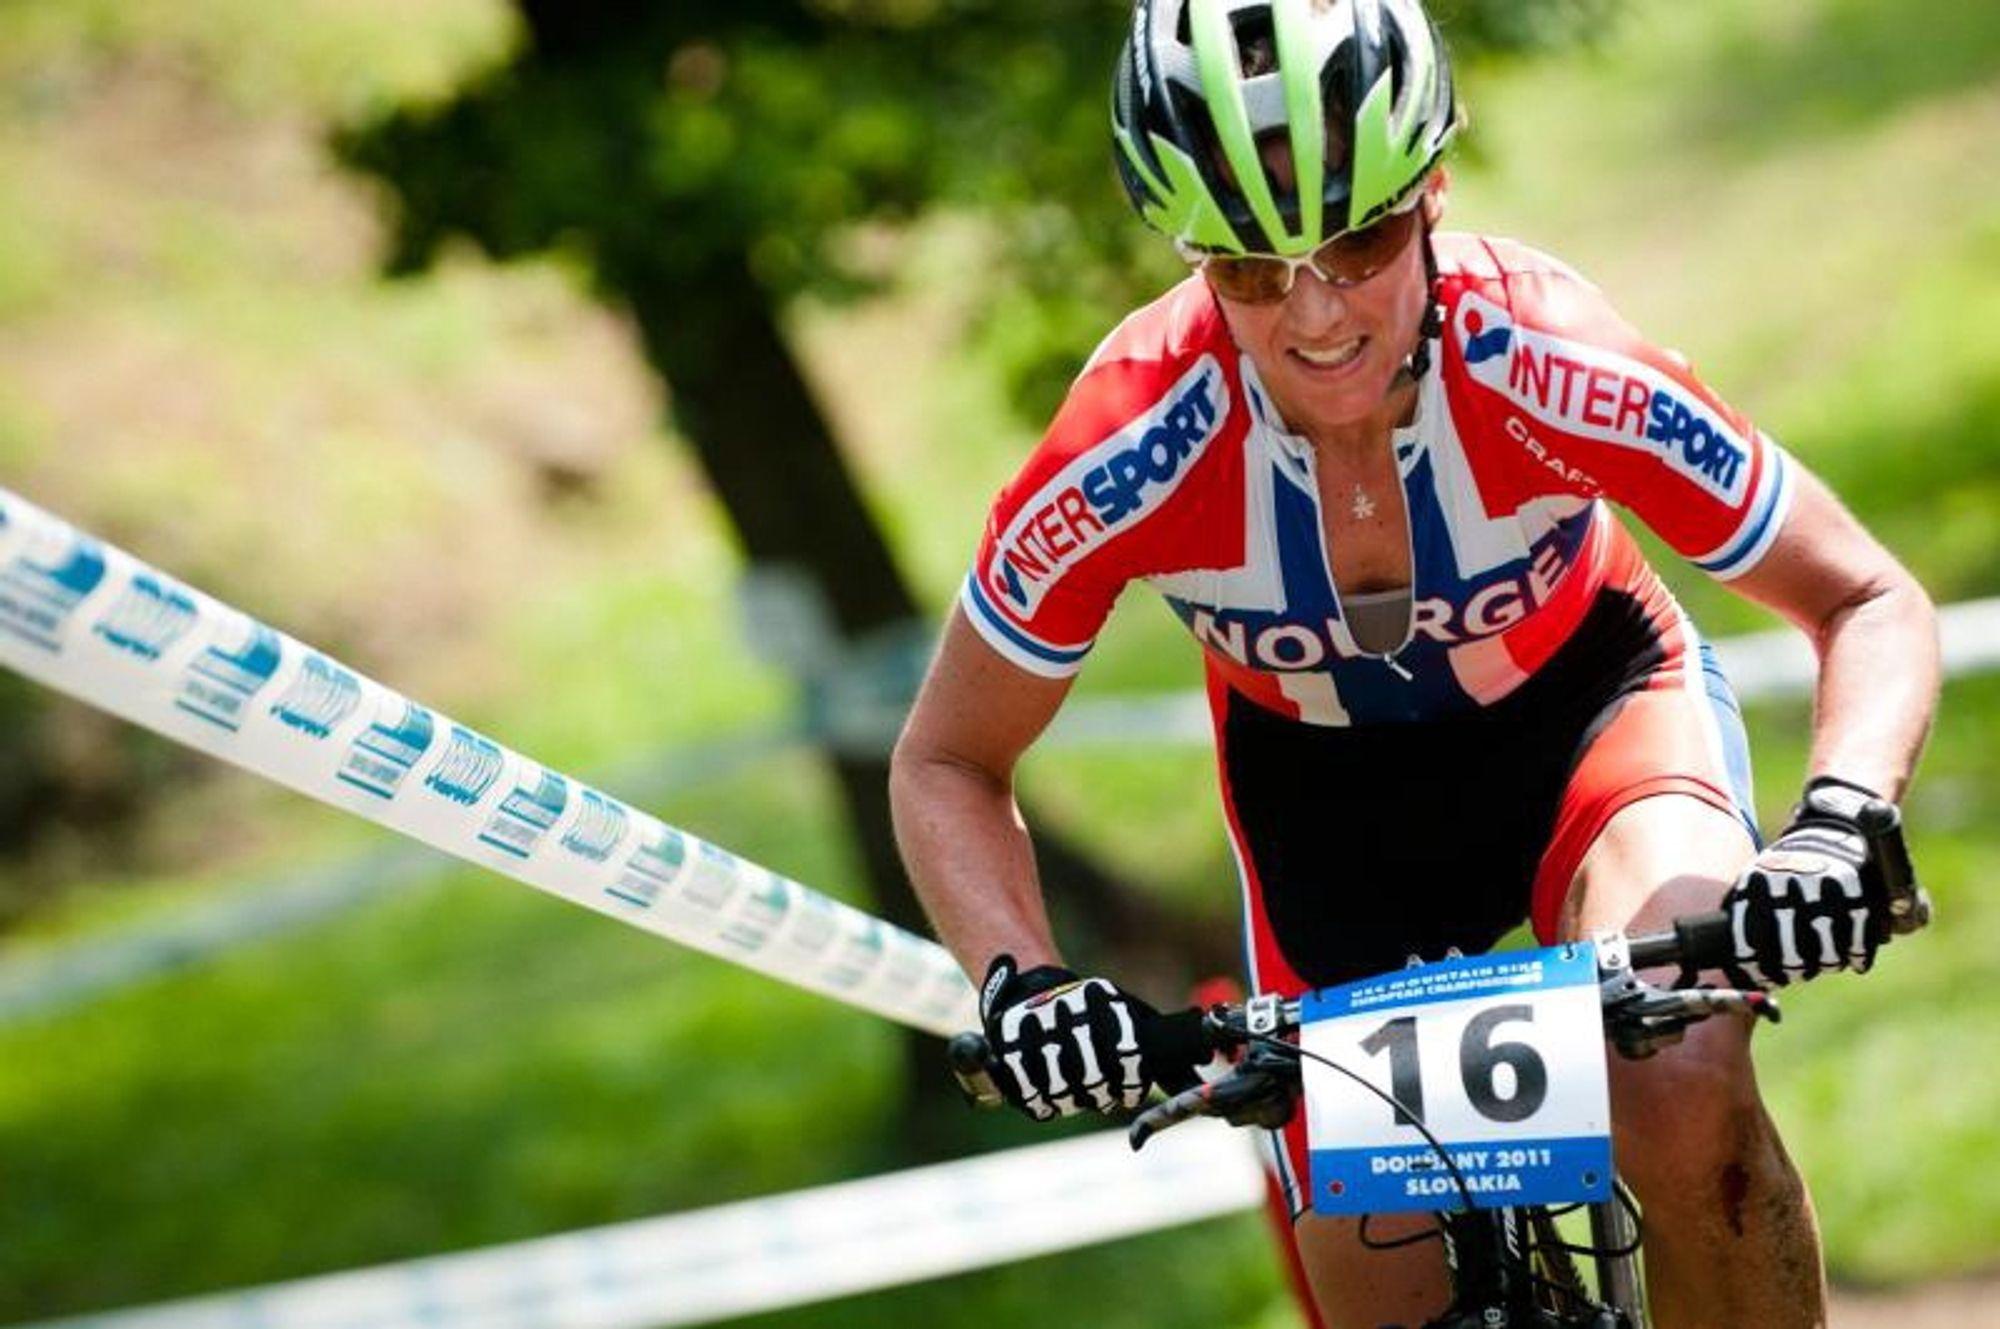 TWENTYNINER: Gunn-Rita Dahle Flesjå sverger til 29'er.